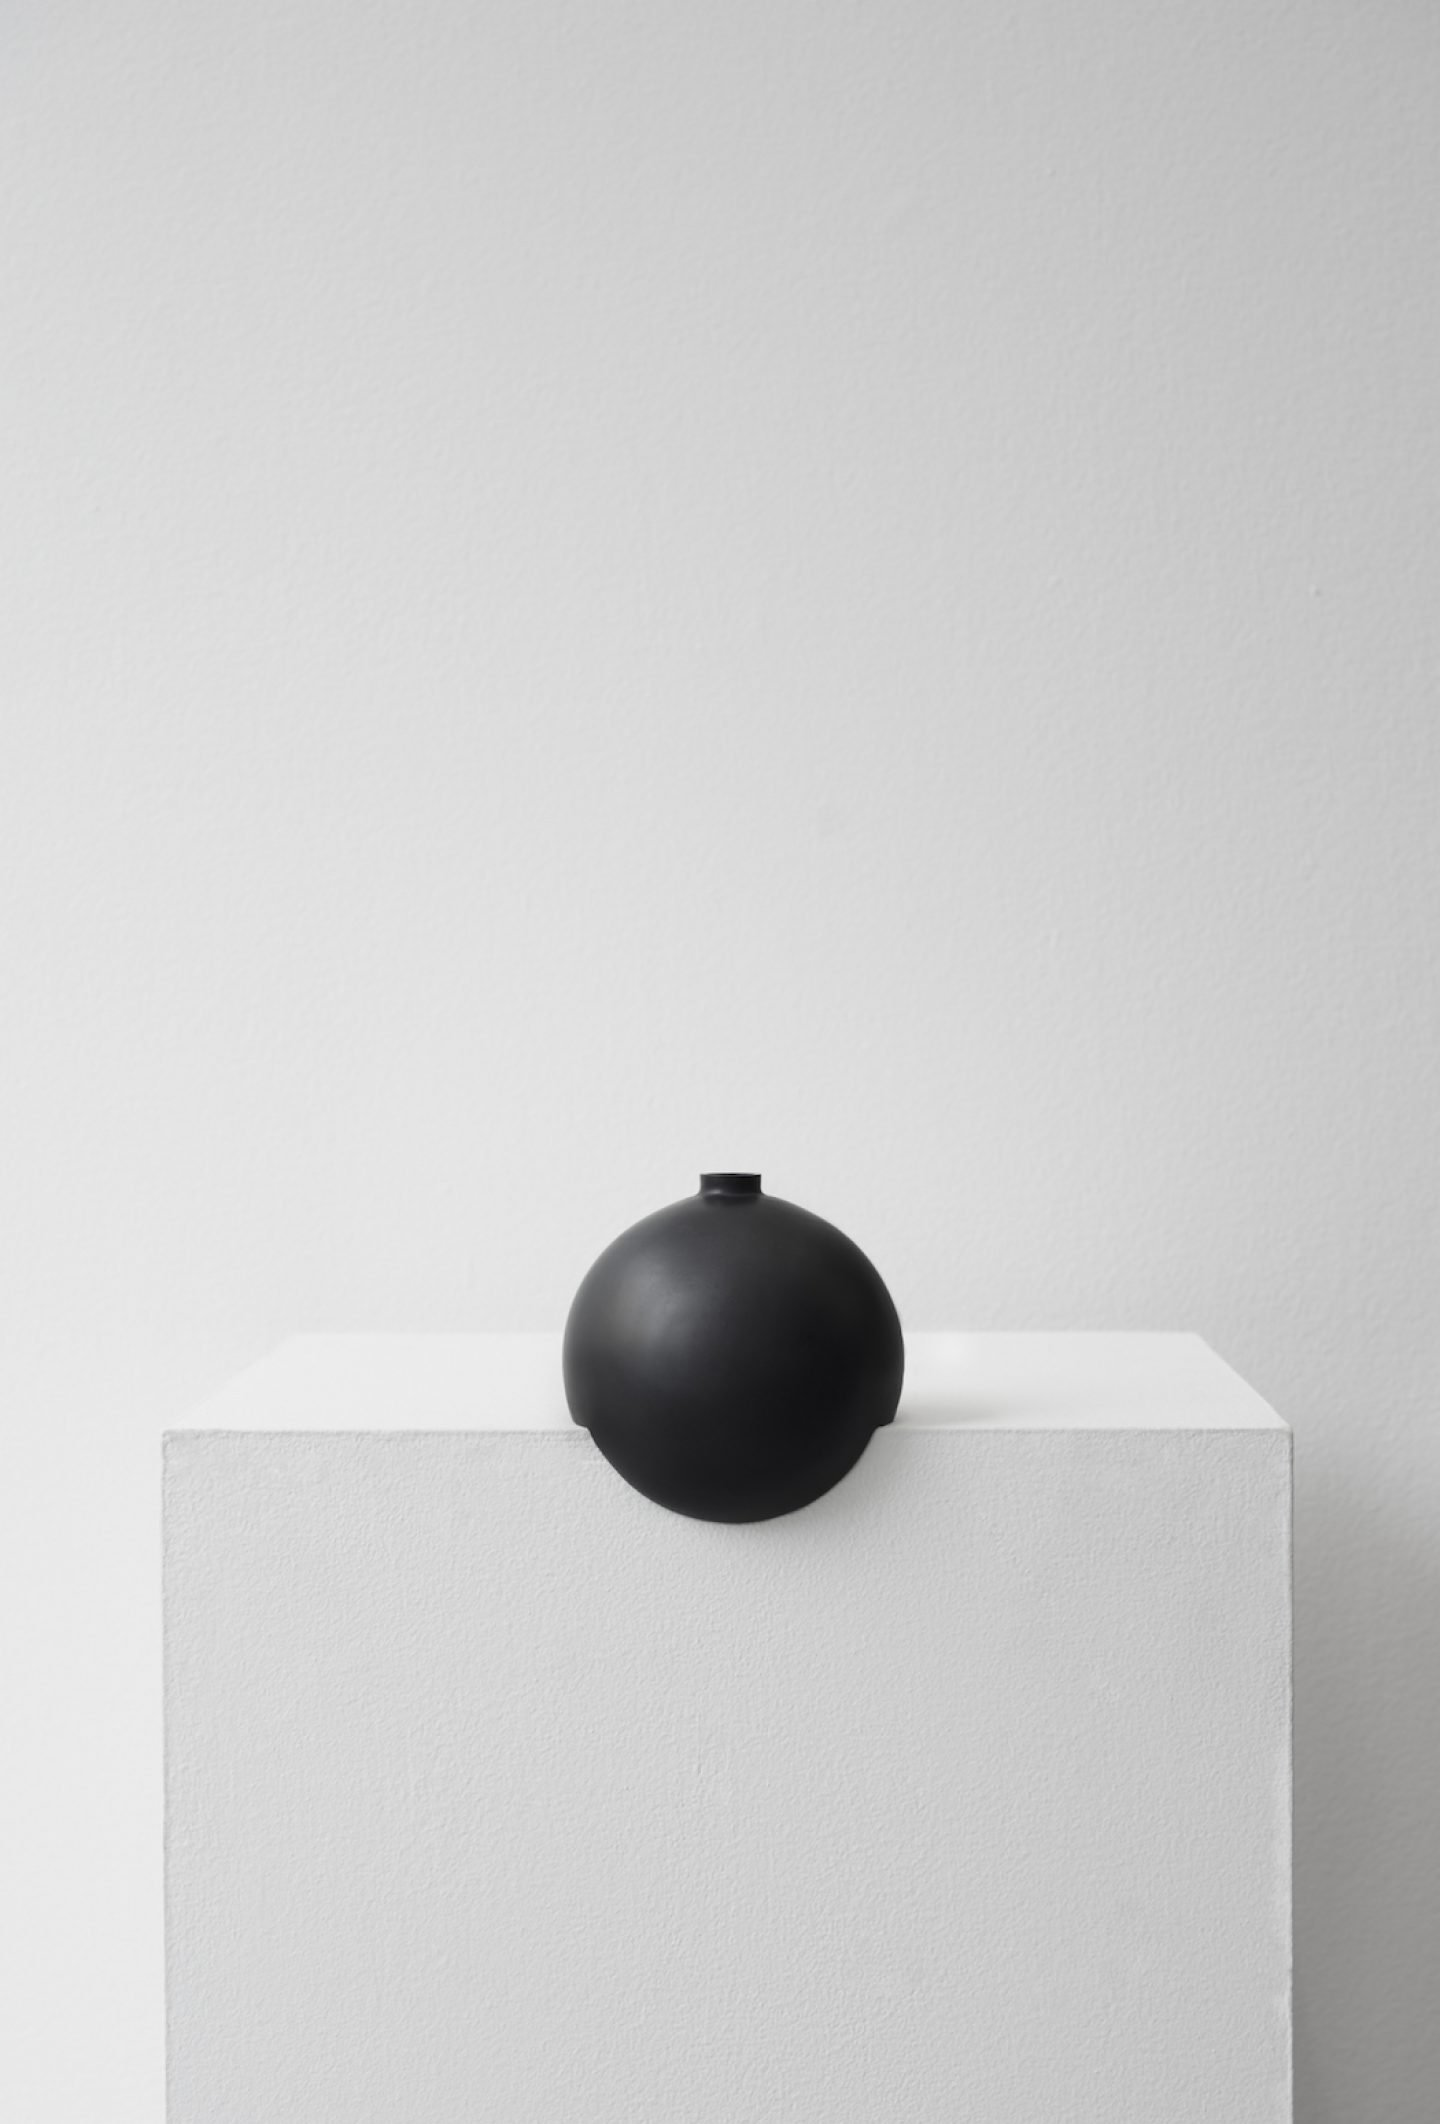 design_tumblevessels1